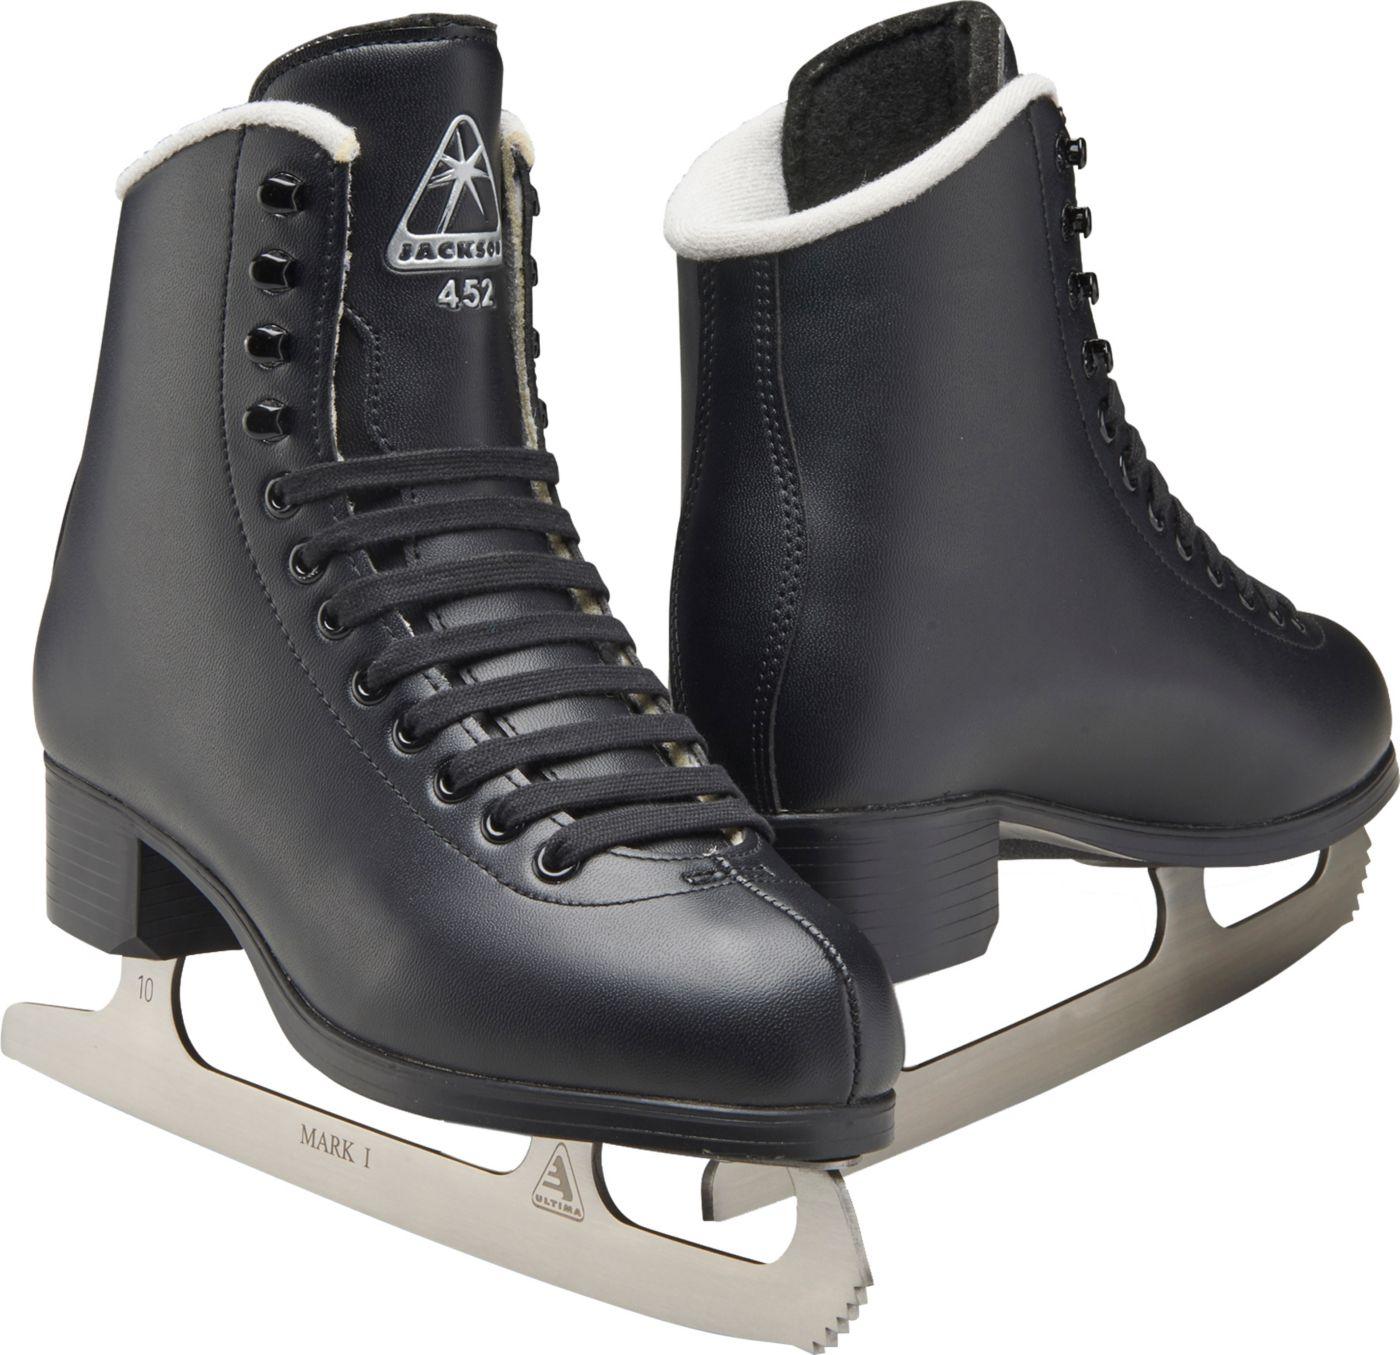 Jackson Ultima Men's Finesse Series Figure Skates